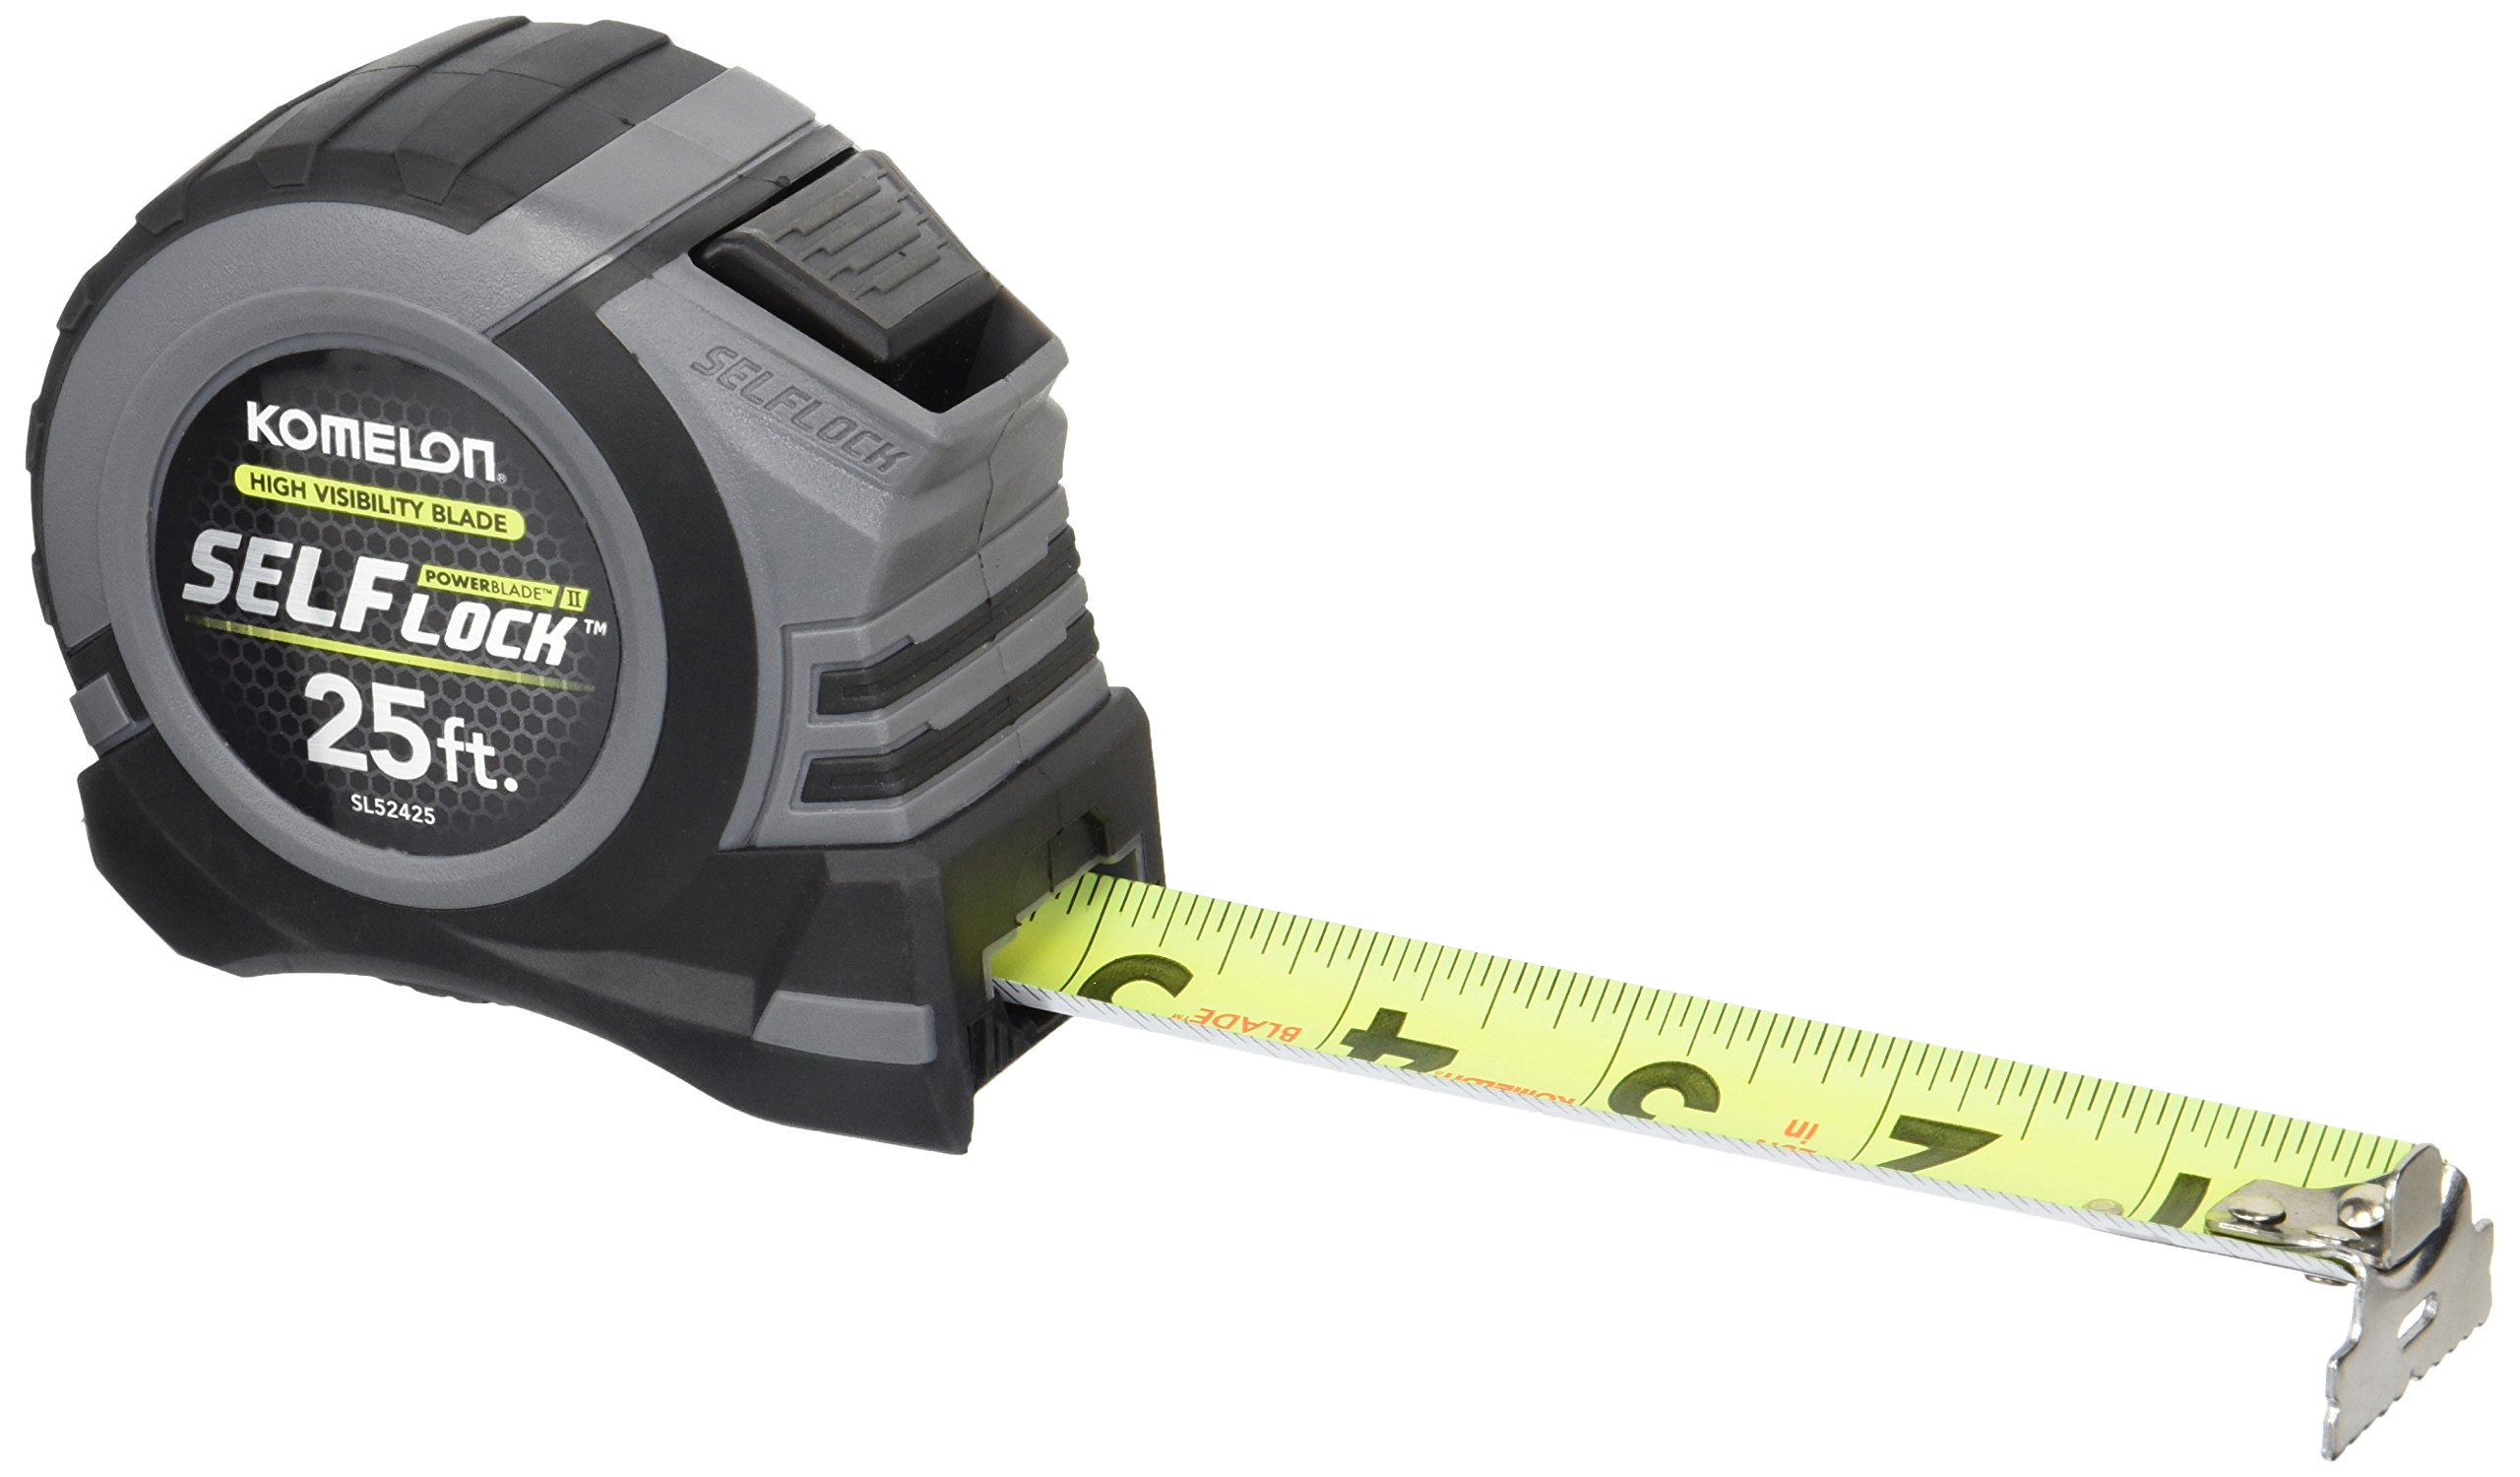 Komelon 25' x 1.06'' Self Locking Powerblade II